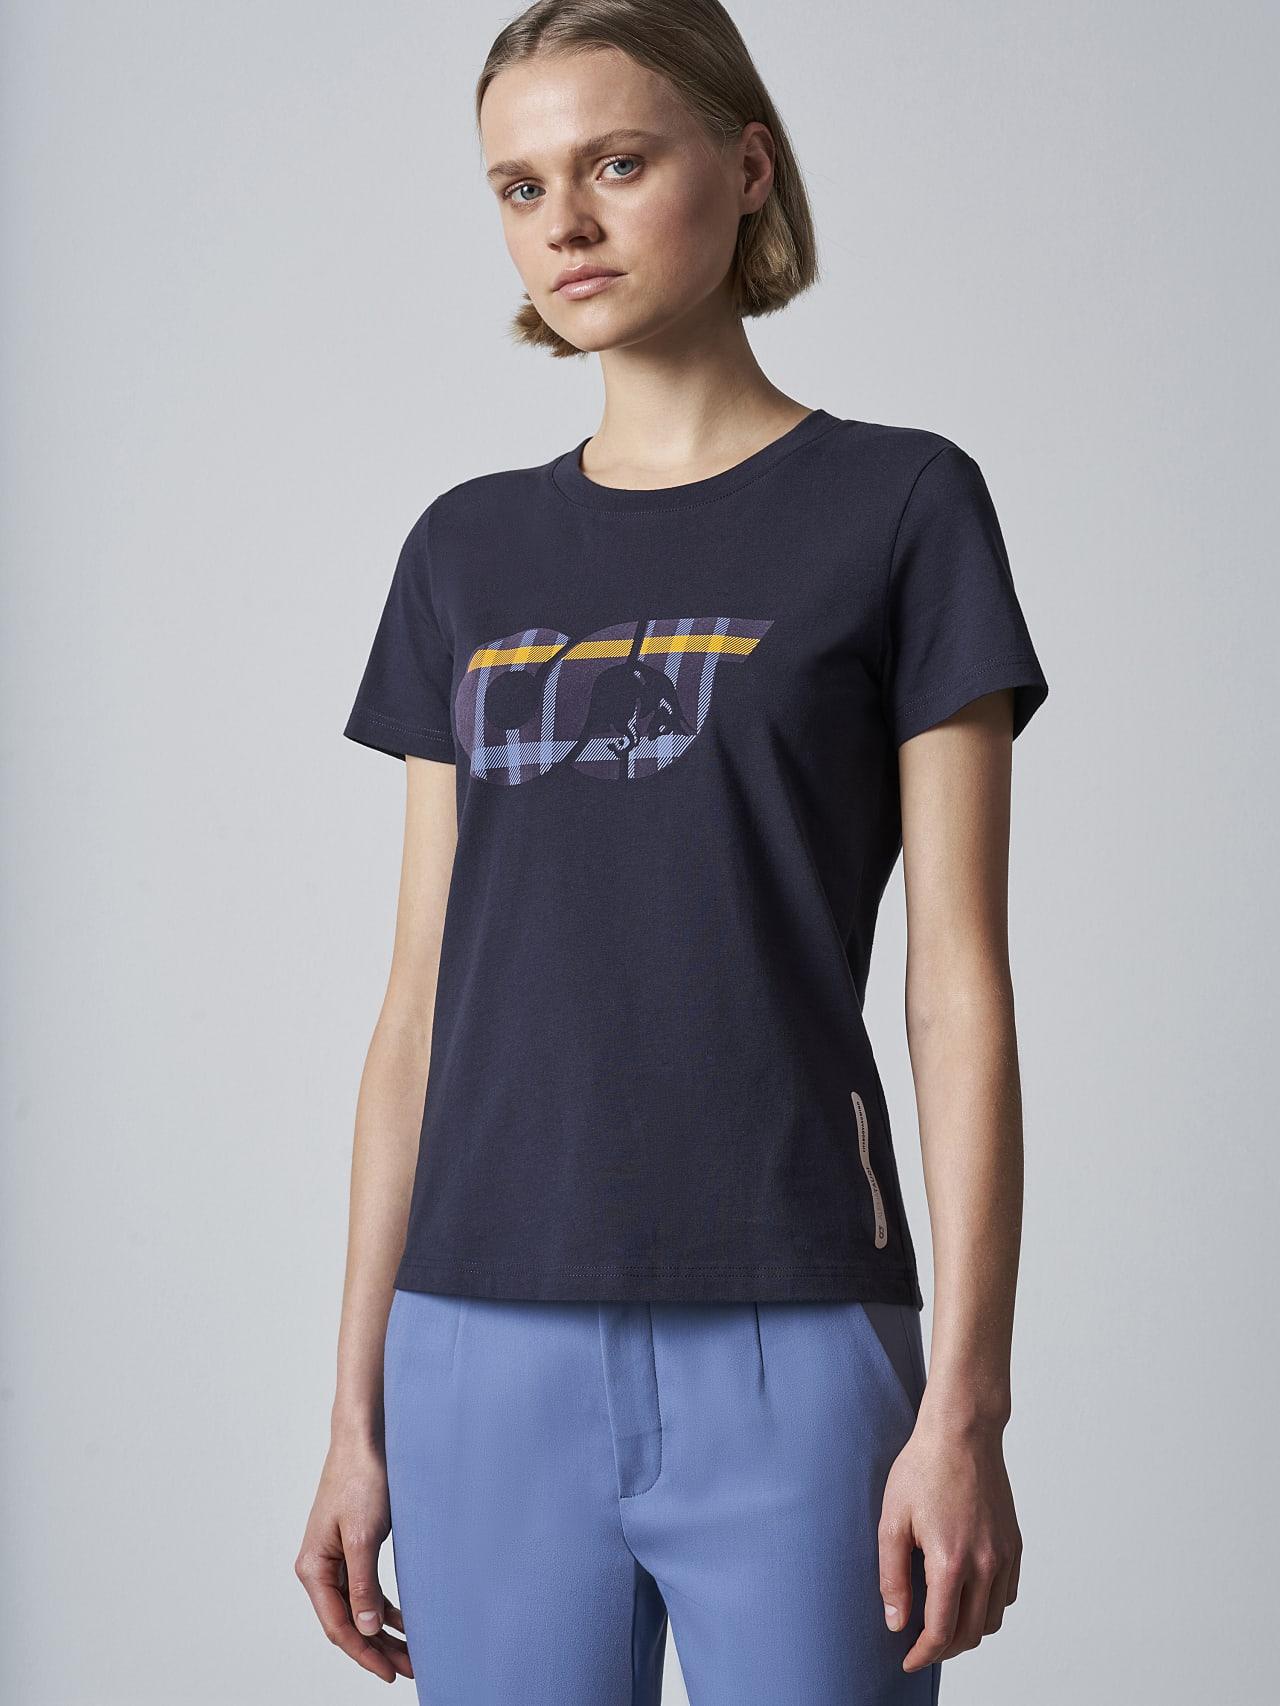 JANPA V1.Y5.02 Logo Print T-Shirt navy Model shot Alpha Tauri